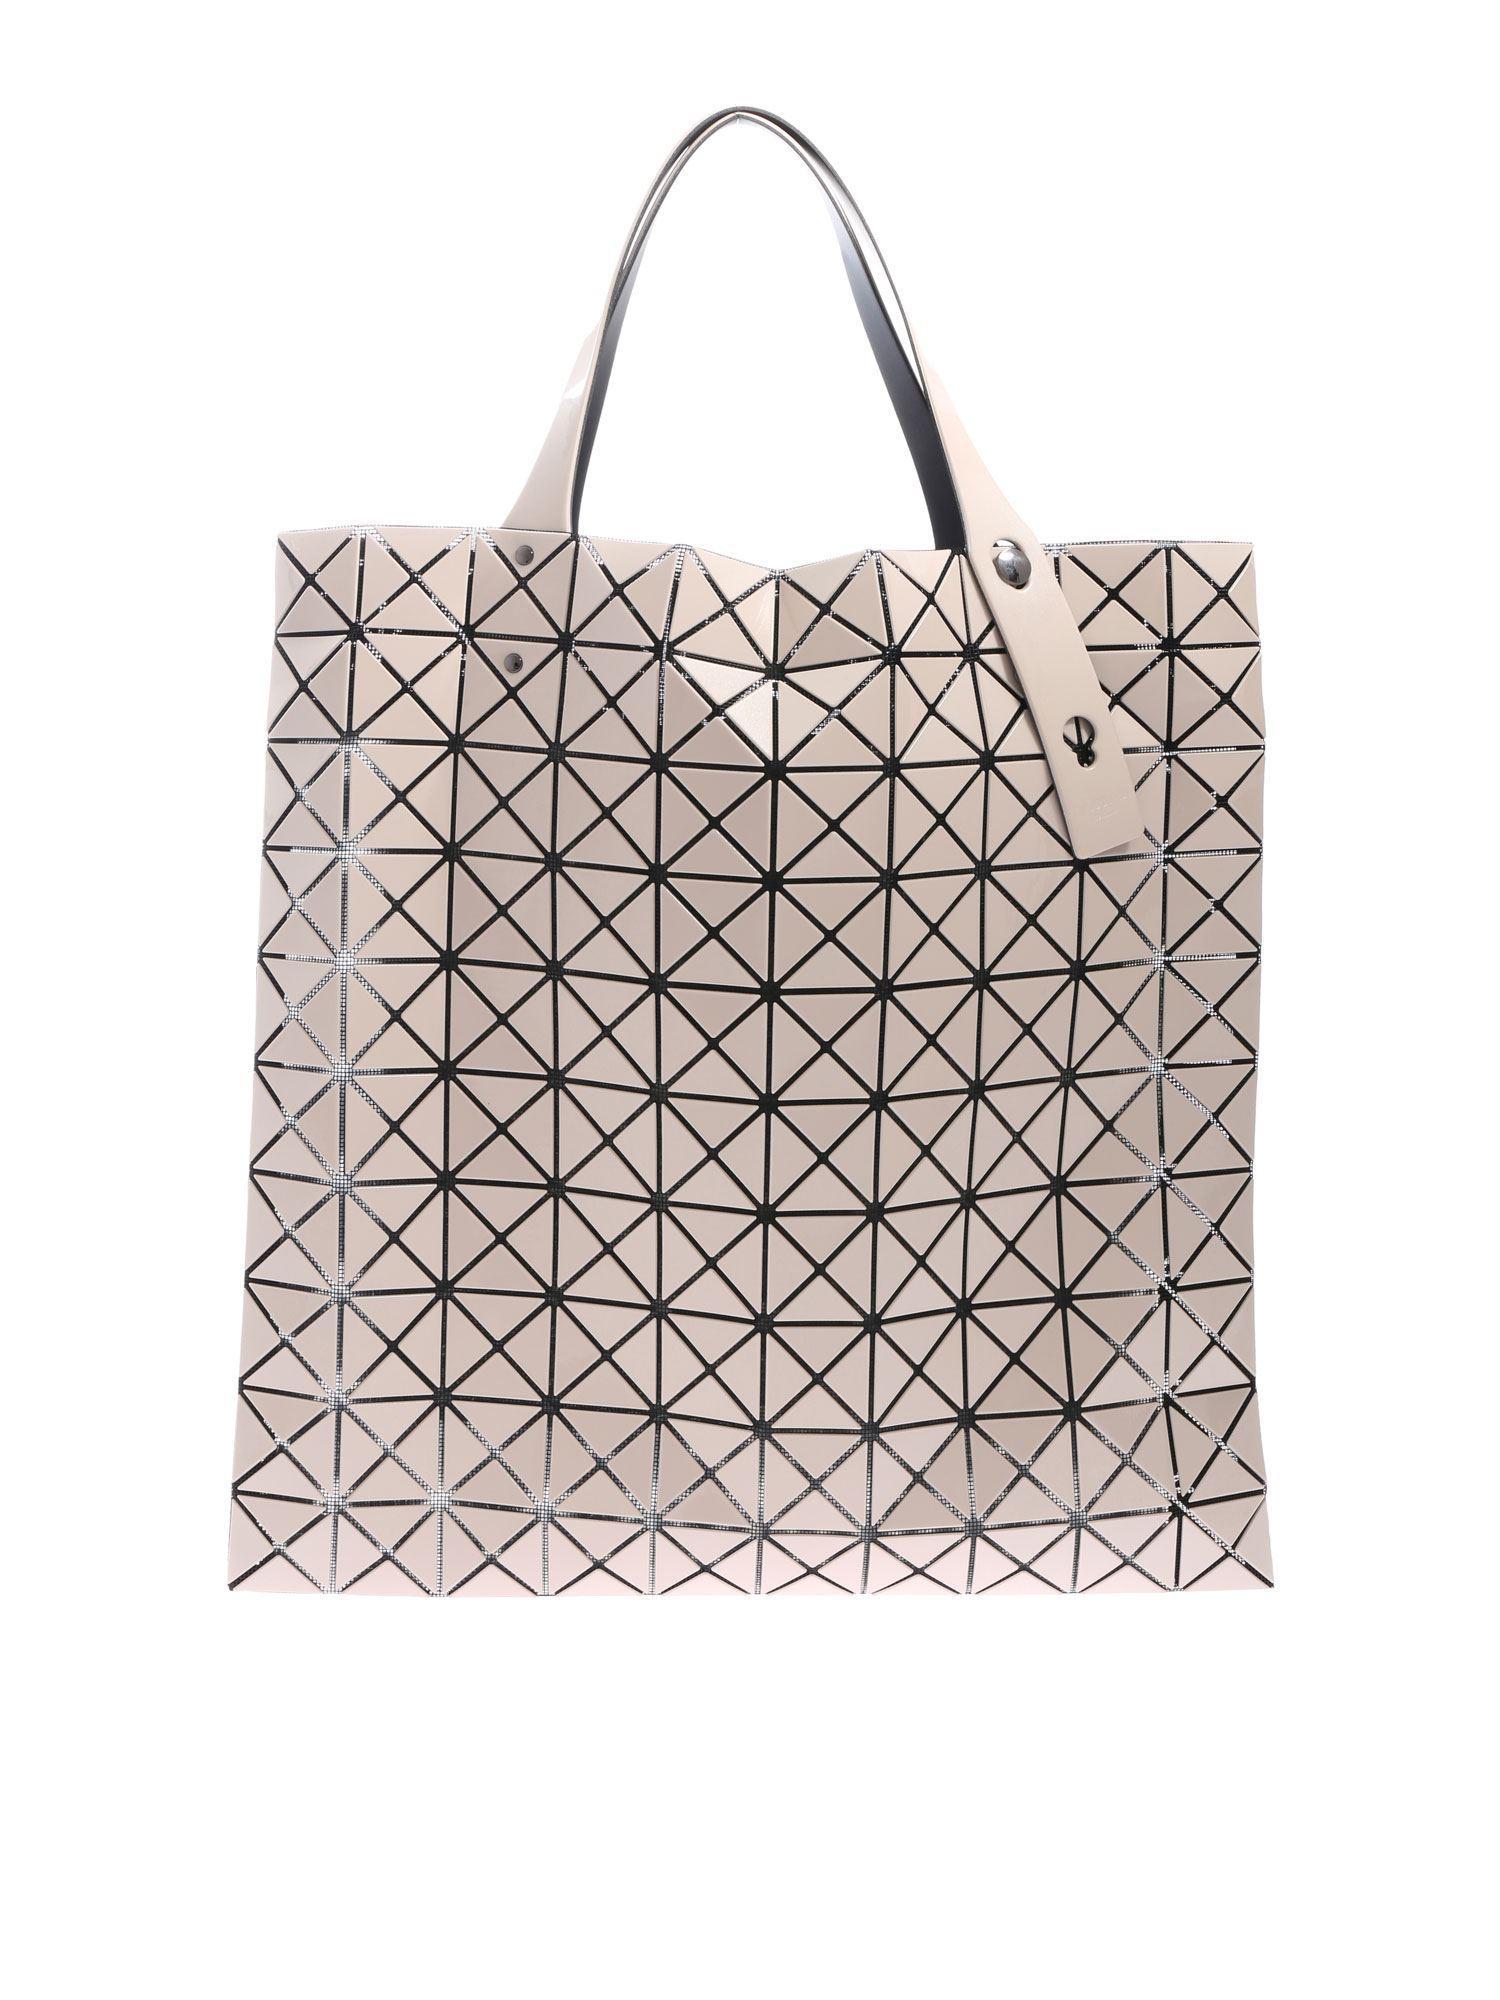 0ee25c43c3b4 Lyst - Bao Bao Issey Miyake Prism Beige Handbag With Triangular ...